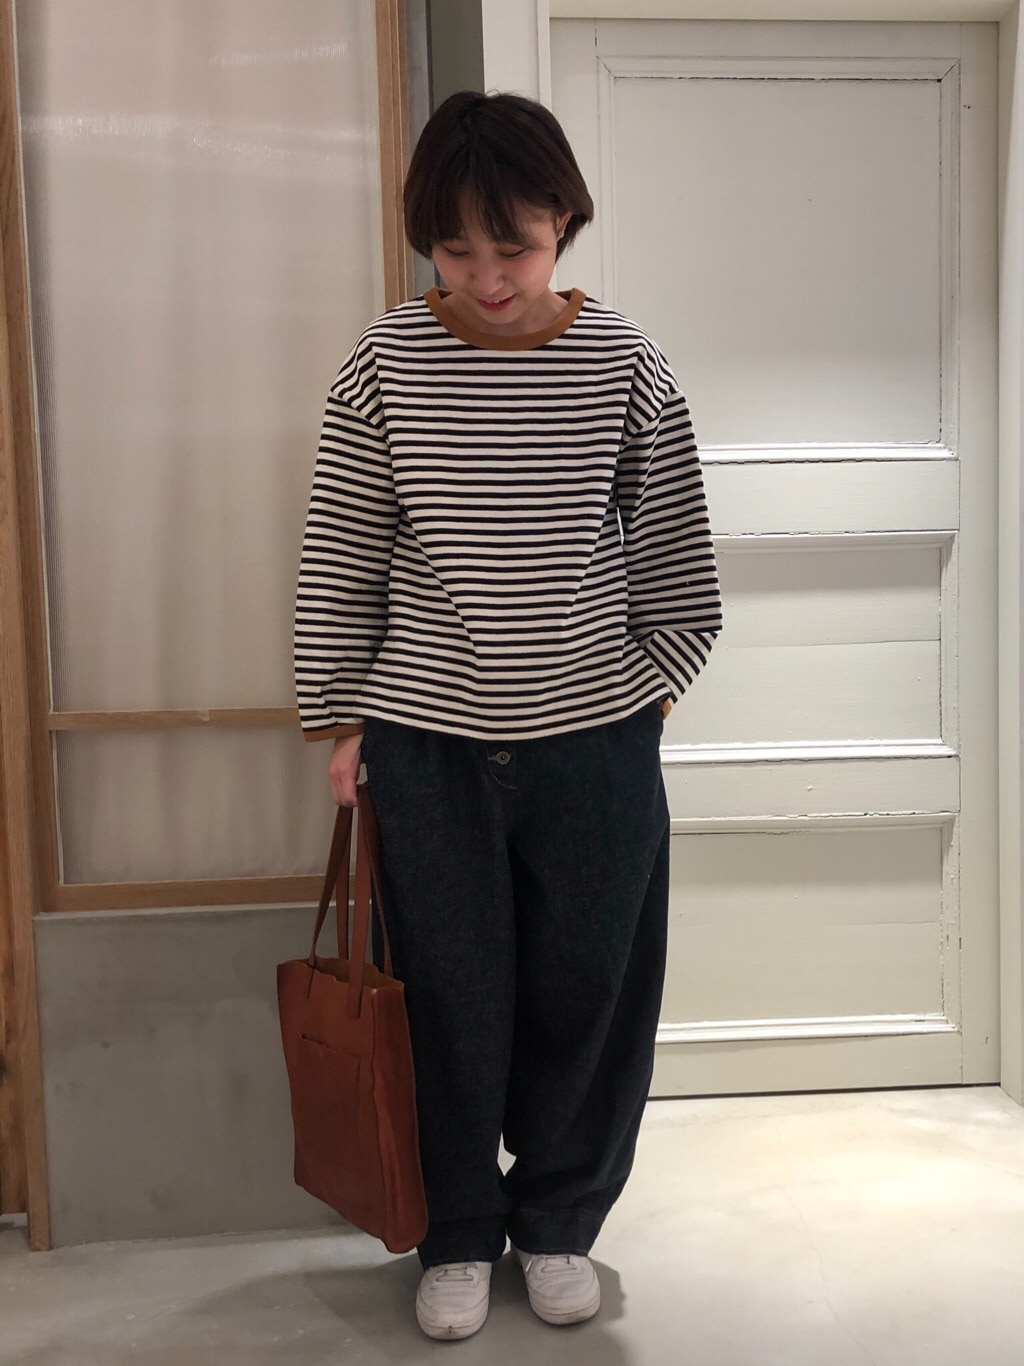 bulle de savon 渋谷スクランブルスクエア 身長:159cm 2020.02.12